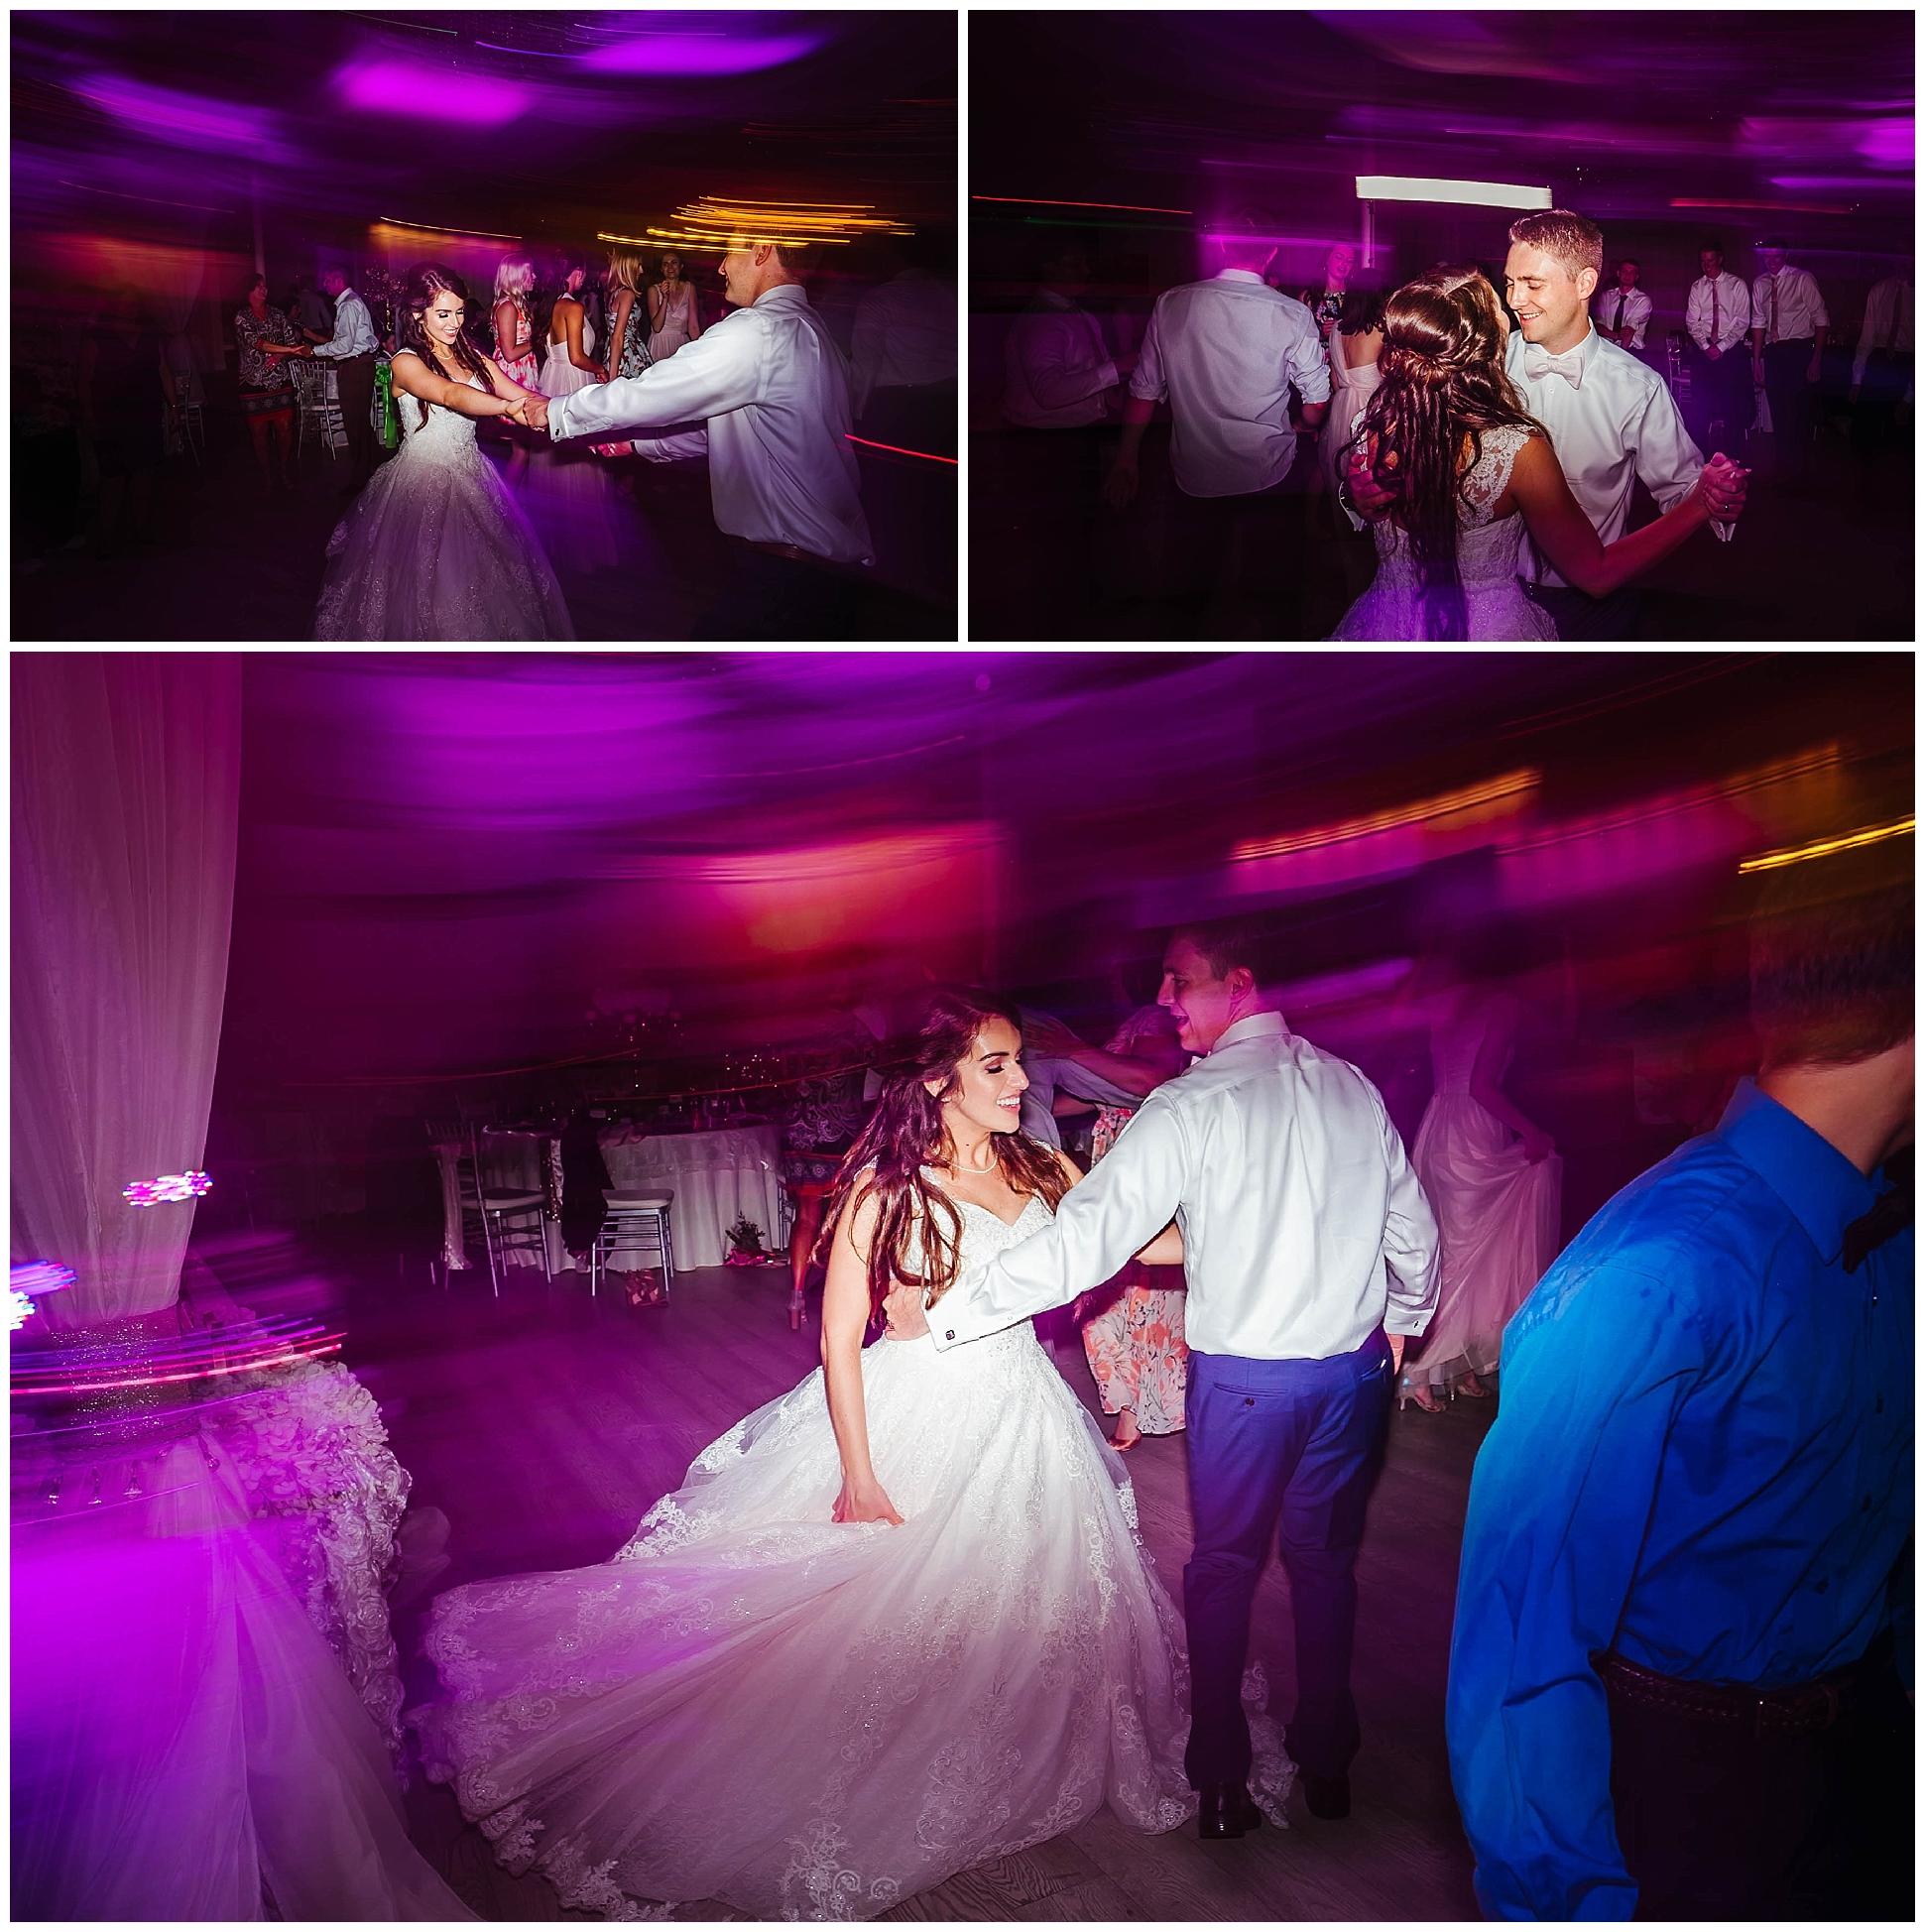 st-pete-wedding-photographer-sunken-gardens-crystal-ballroom-princess-dancer_0207.jpg